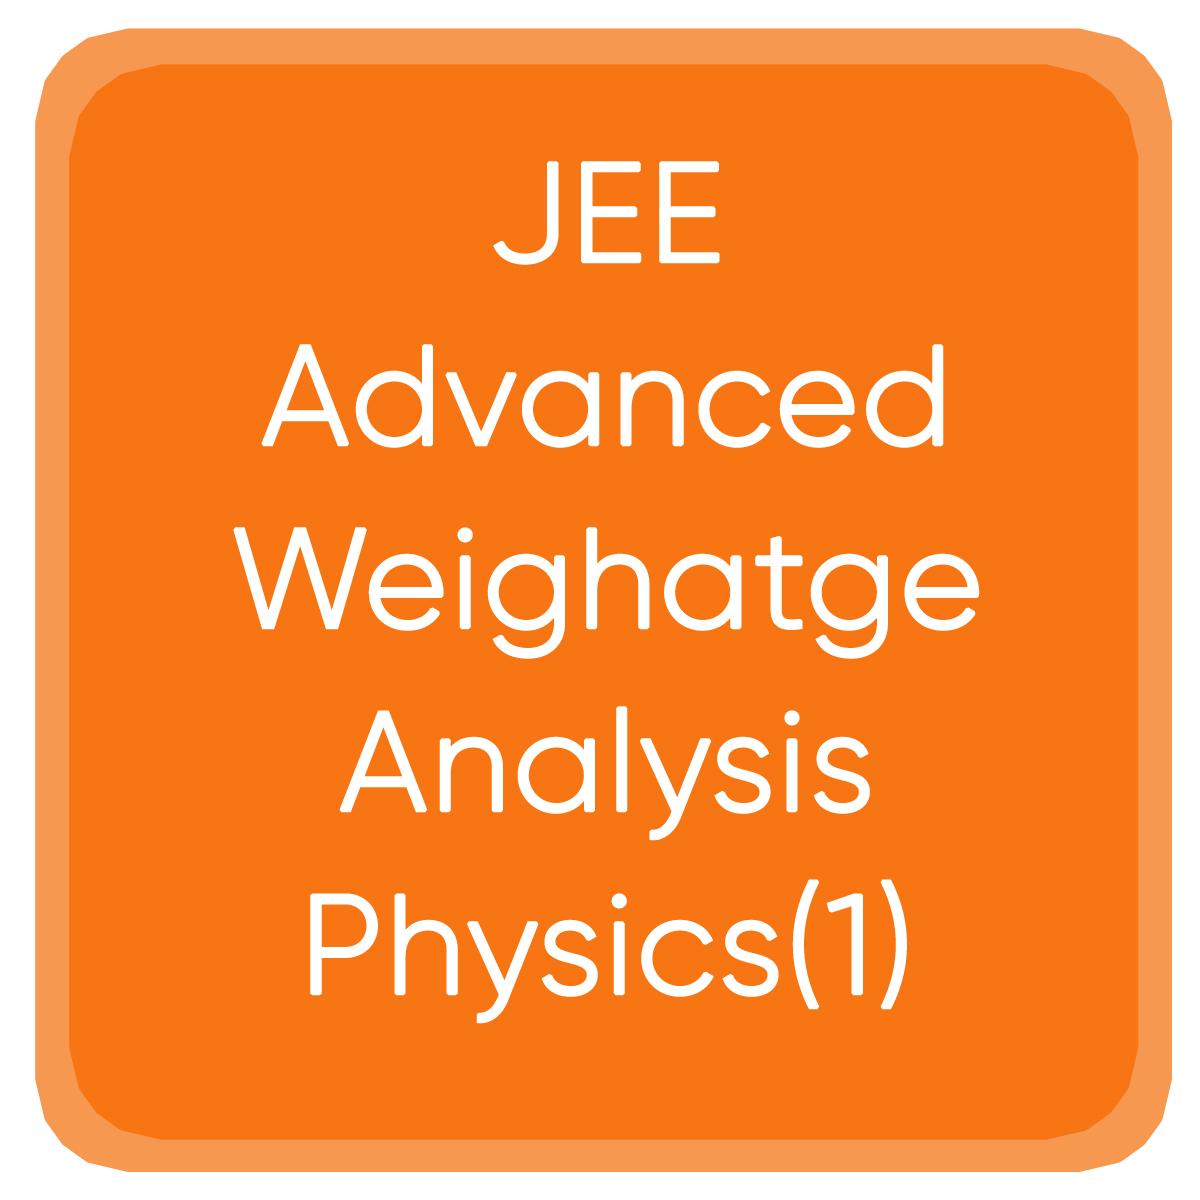 JEE Advanced Weighatge Analysis Physics(1)